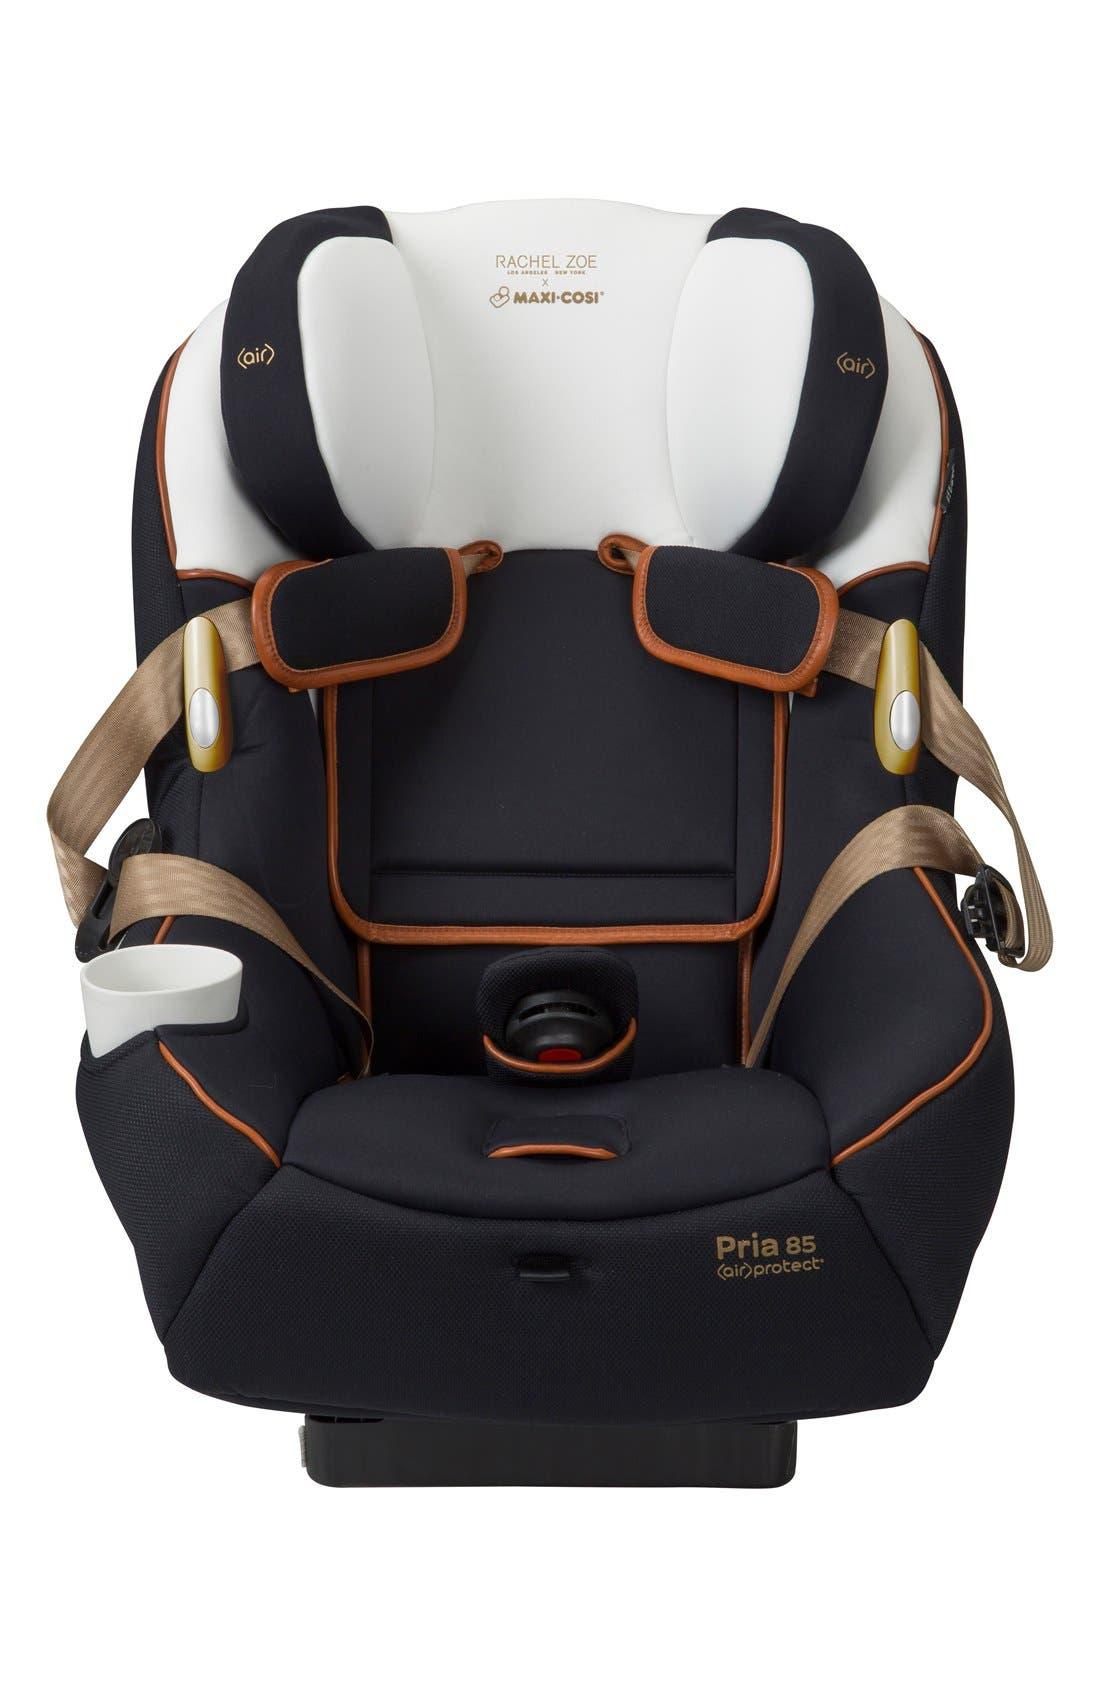 x Rachel Zoe Pria<sup>™</sup> 85 - Special Edition Car Seat,                             Alternate thumbnail 2, color,                             Black/ White